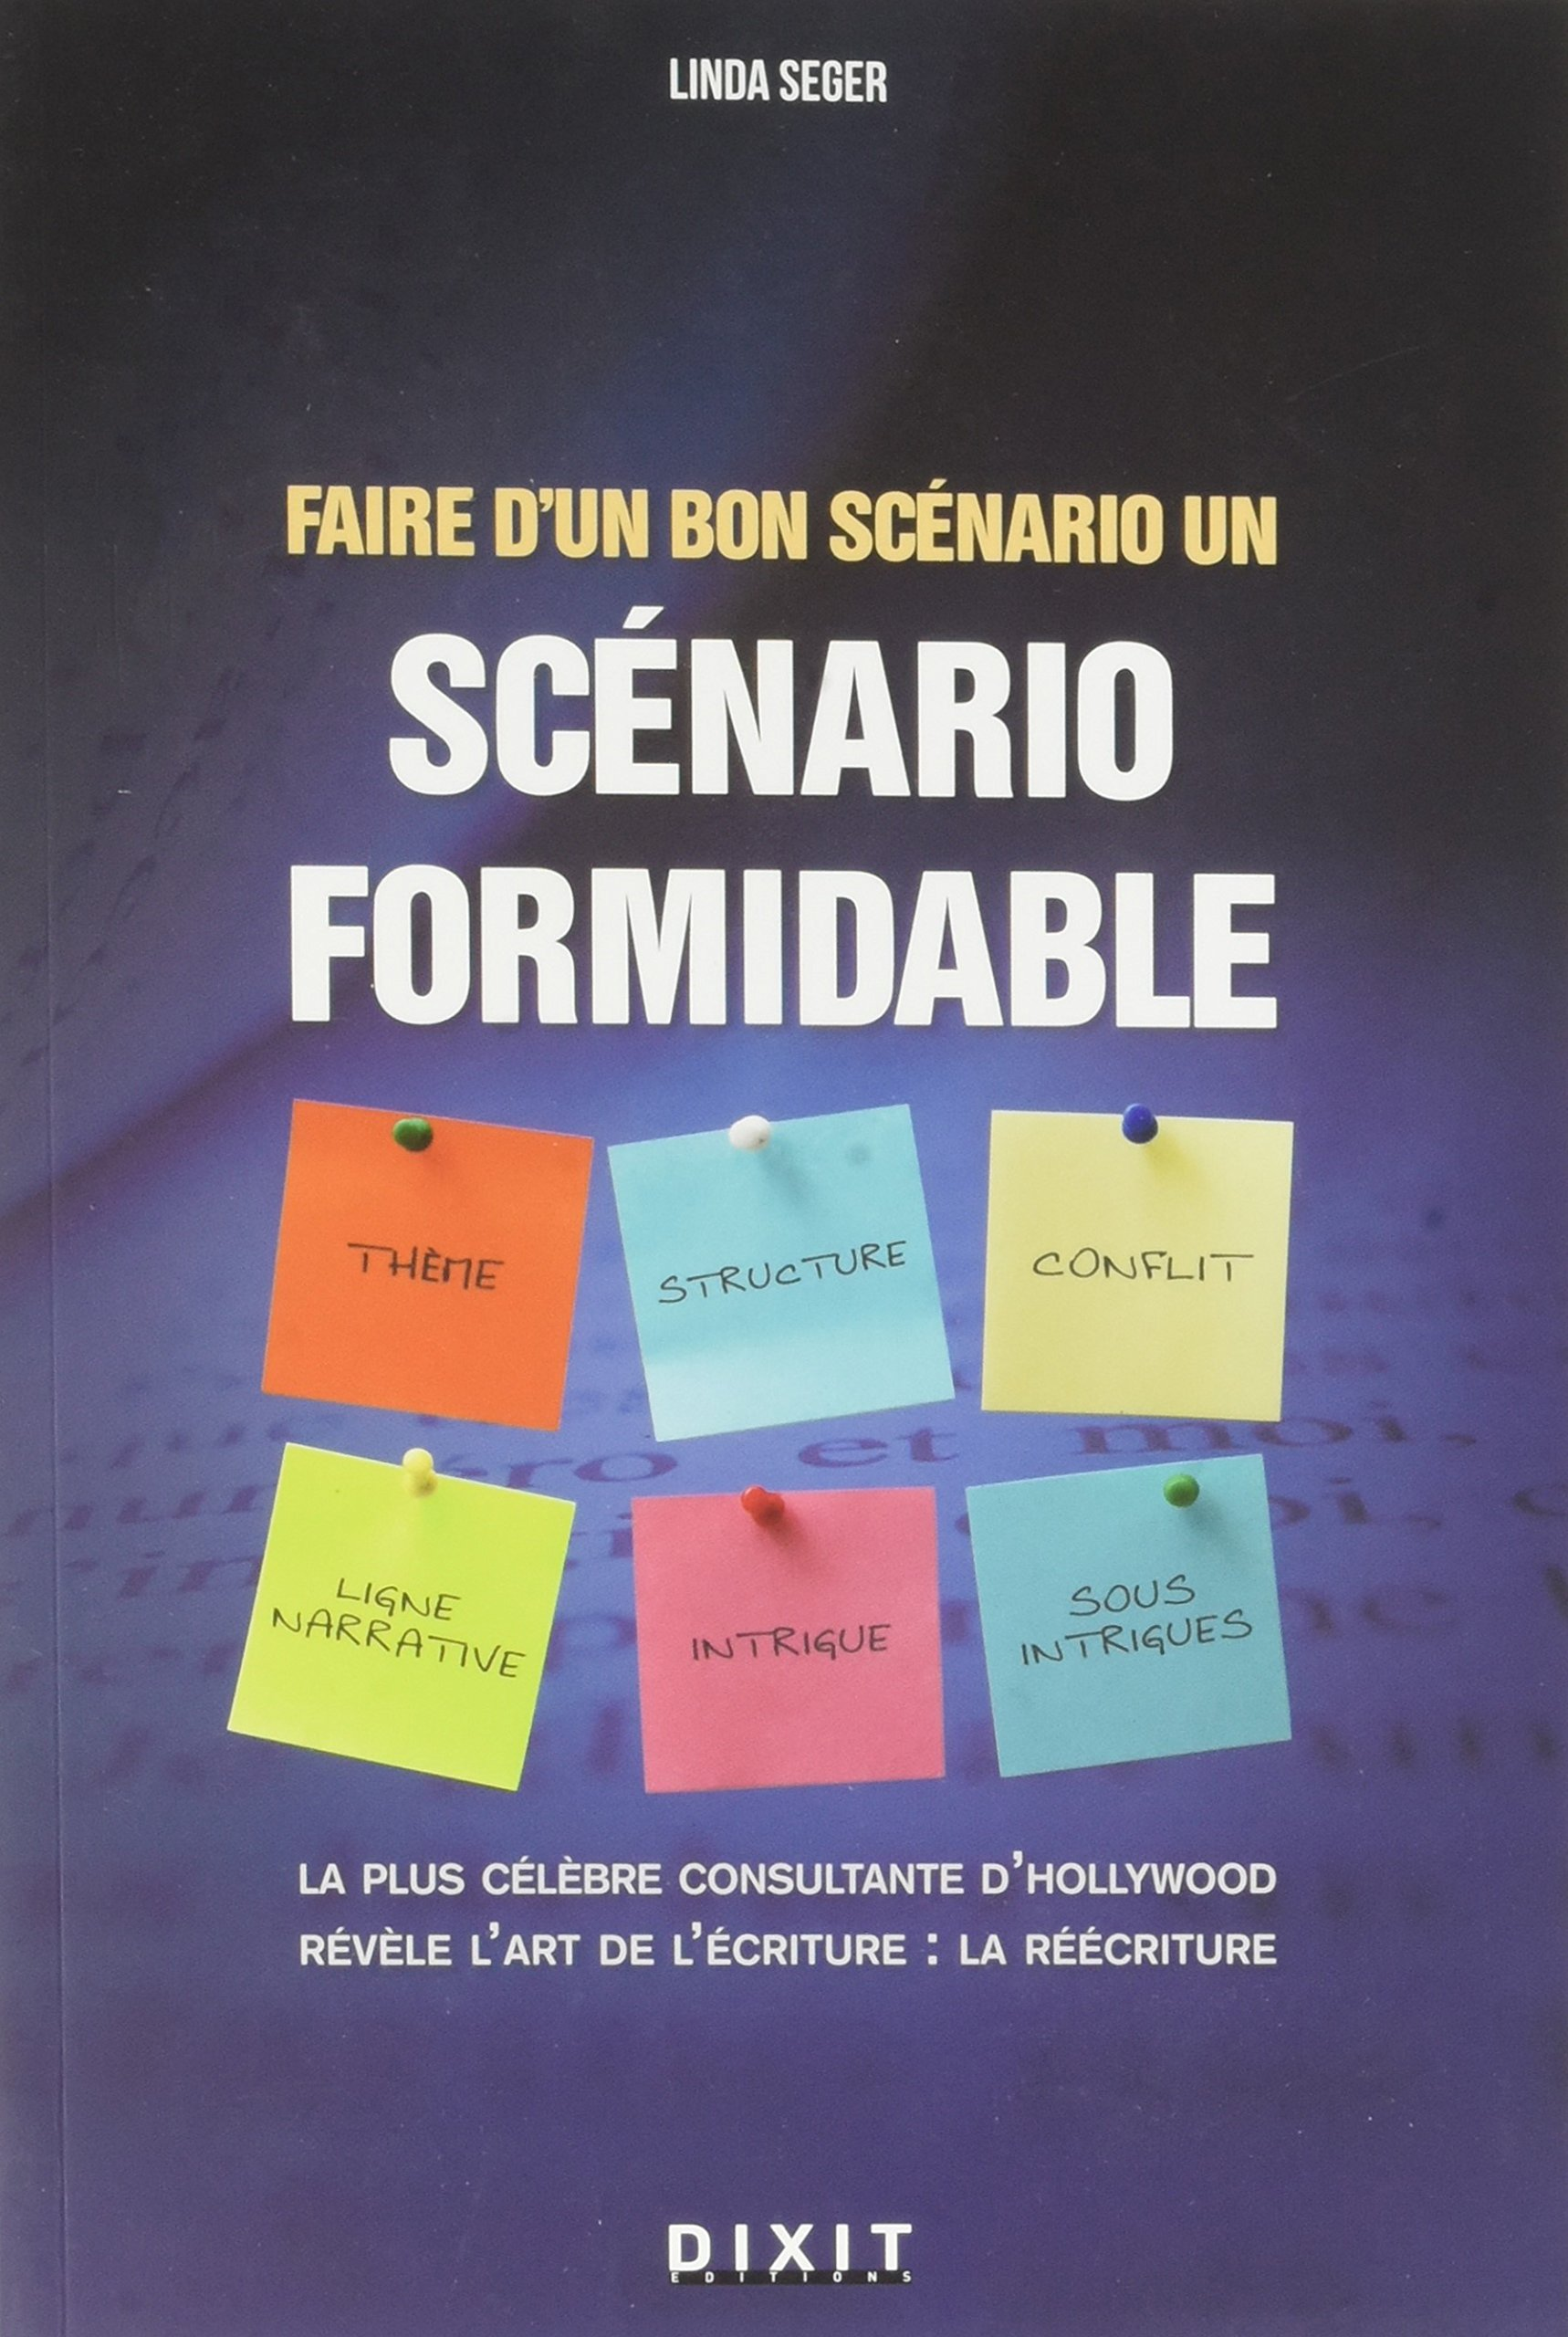 Faire d'un bon scénario un scénario formidable Broché – 10 janvier 2005 Linda Seger DIXIT 2844810934 379782844810939